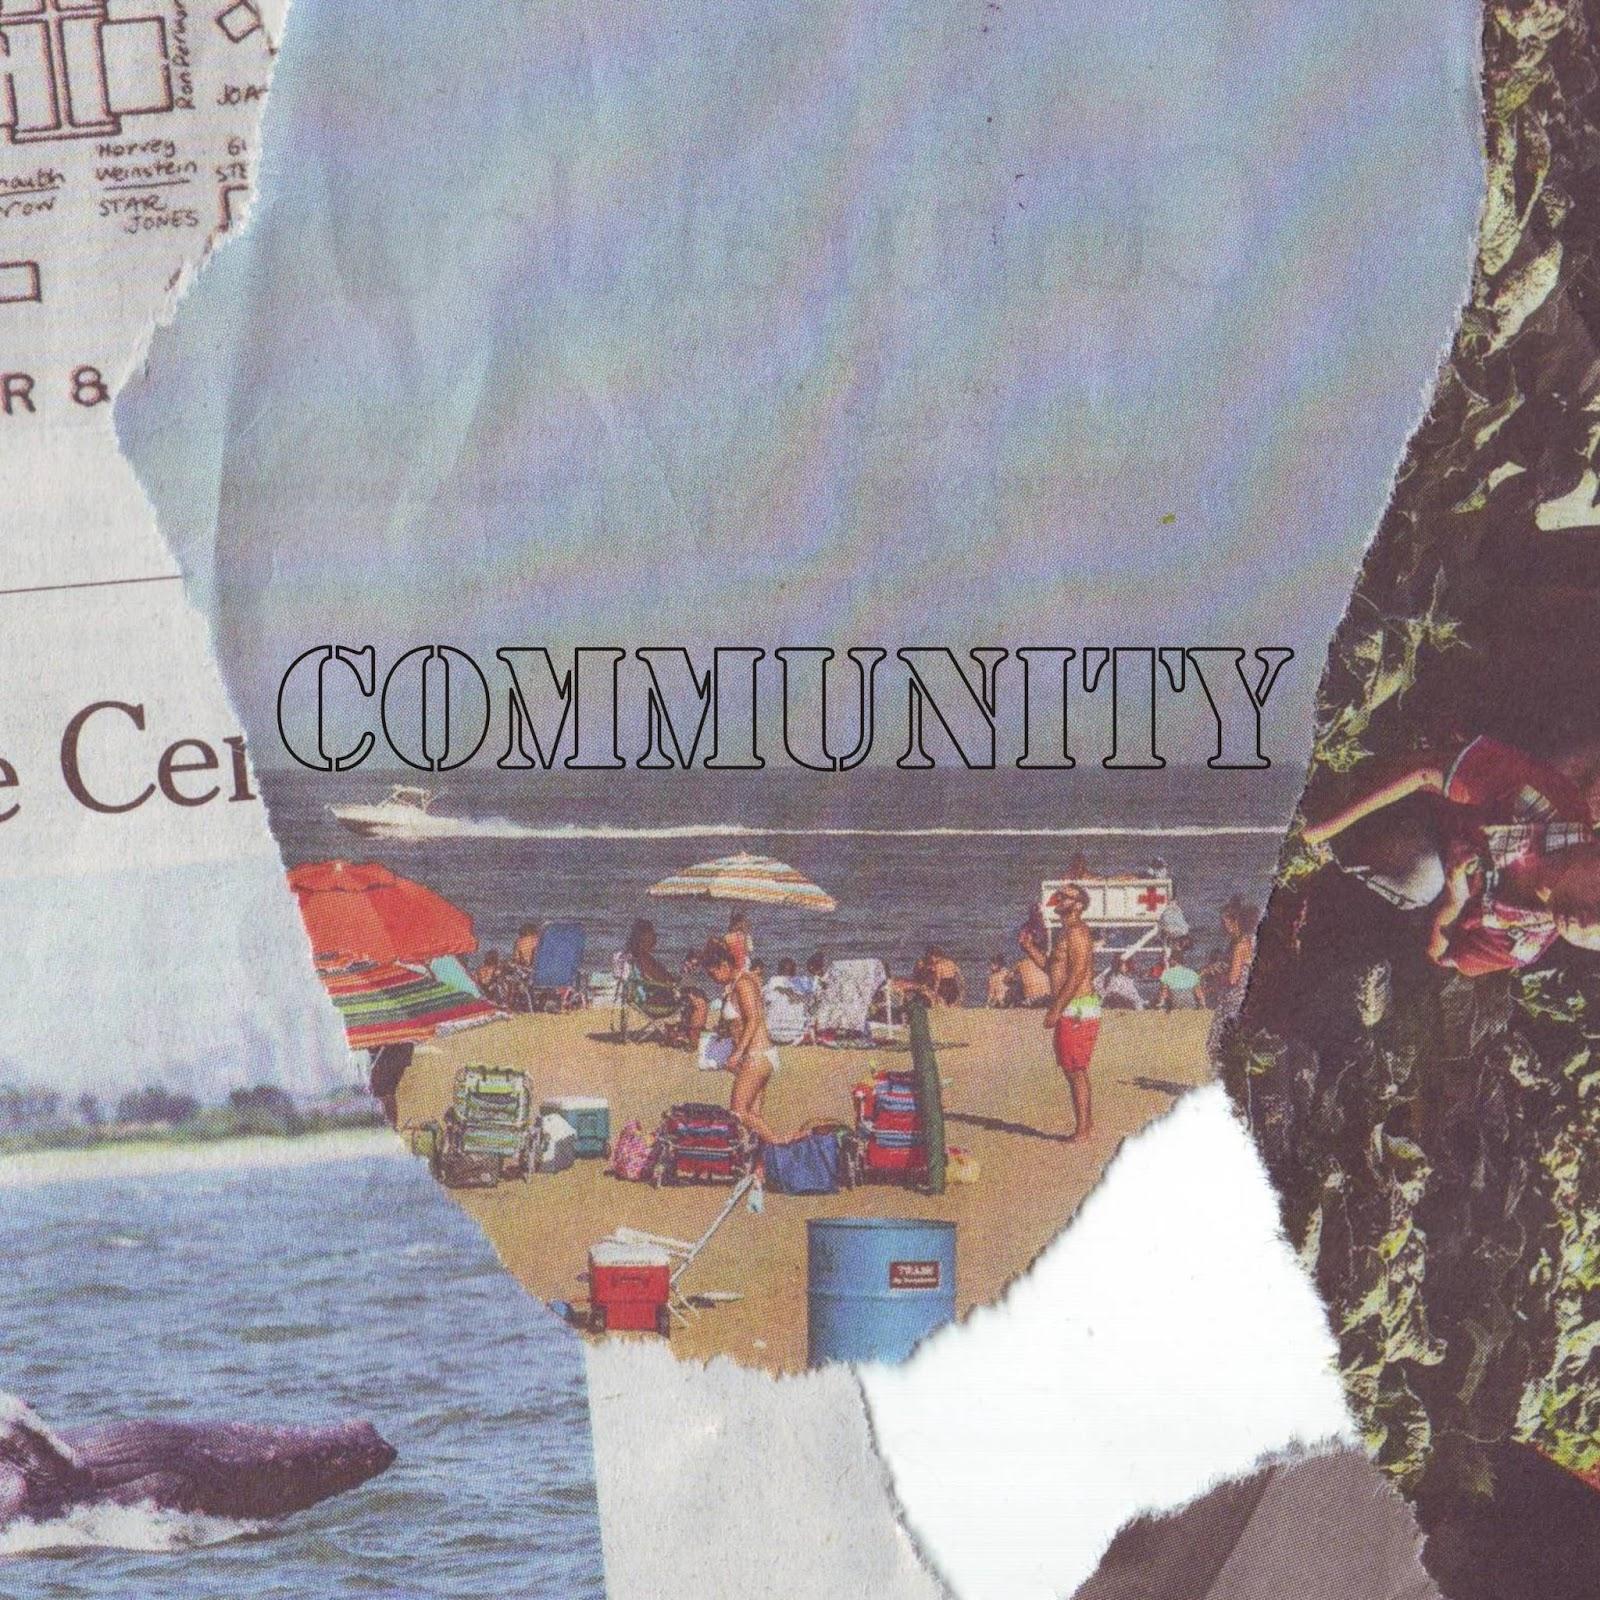 6. Graham Lambkin - Community [Kye]